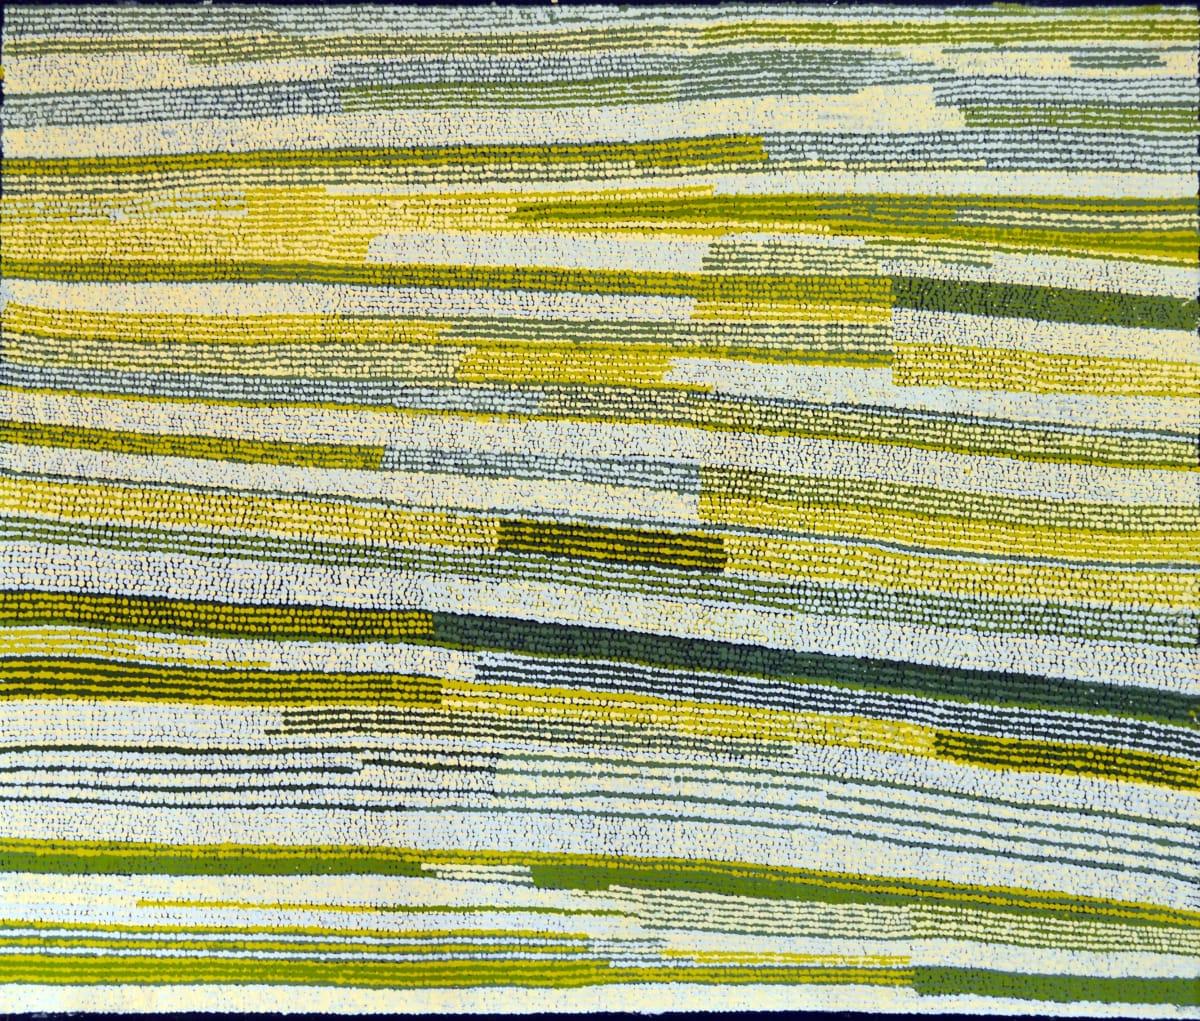 Yurpiya Lionel Anumara acrylic on linen 82 x 100 cm